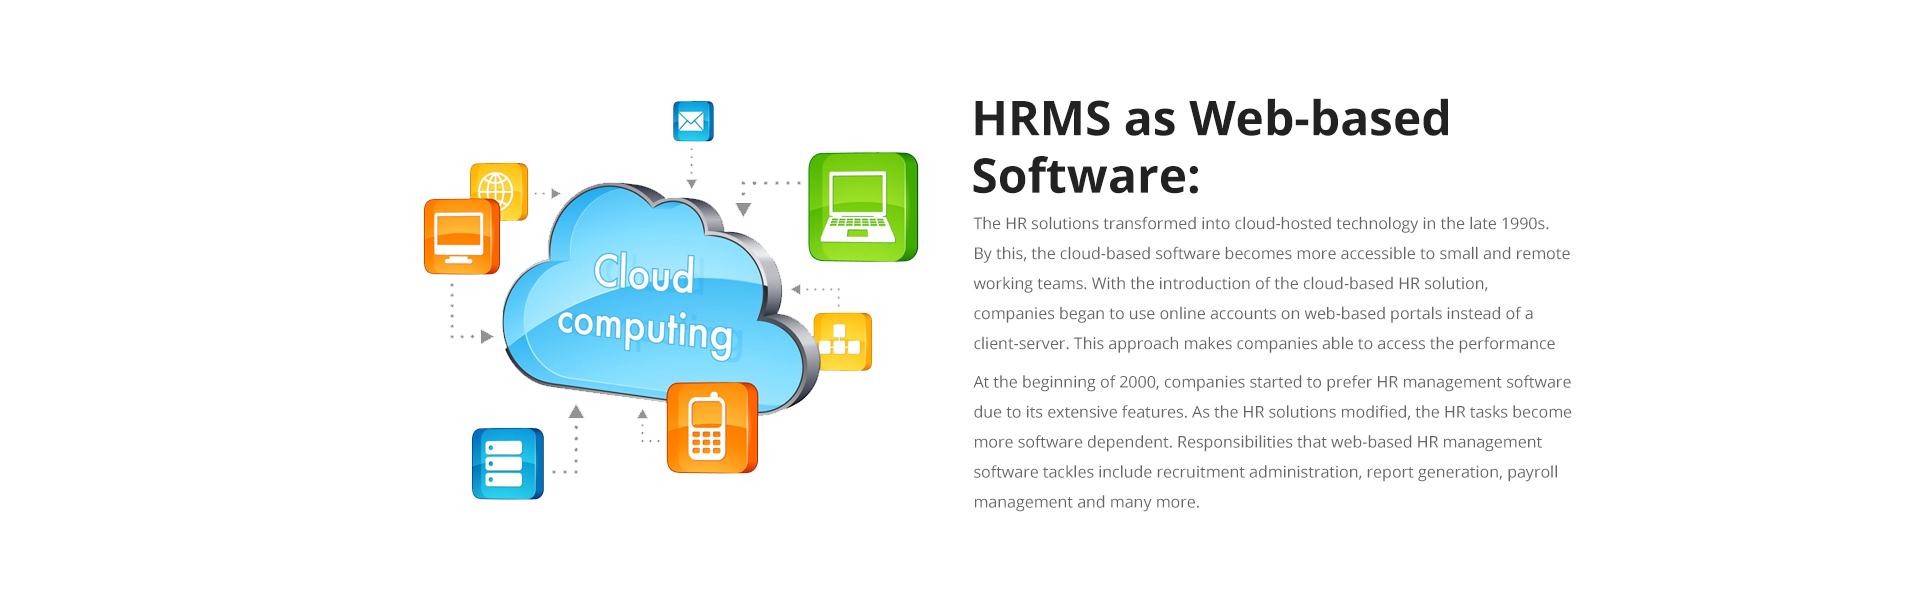 Web based HRM